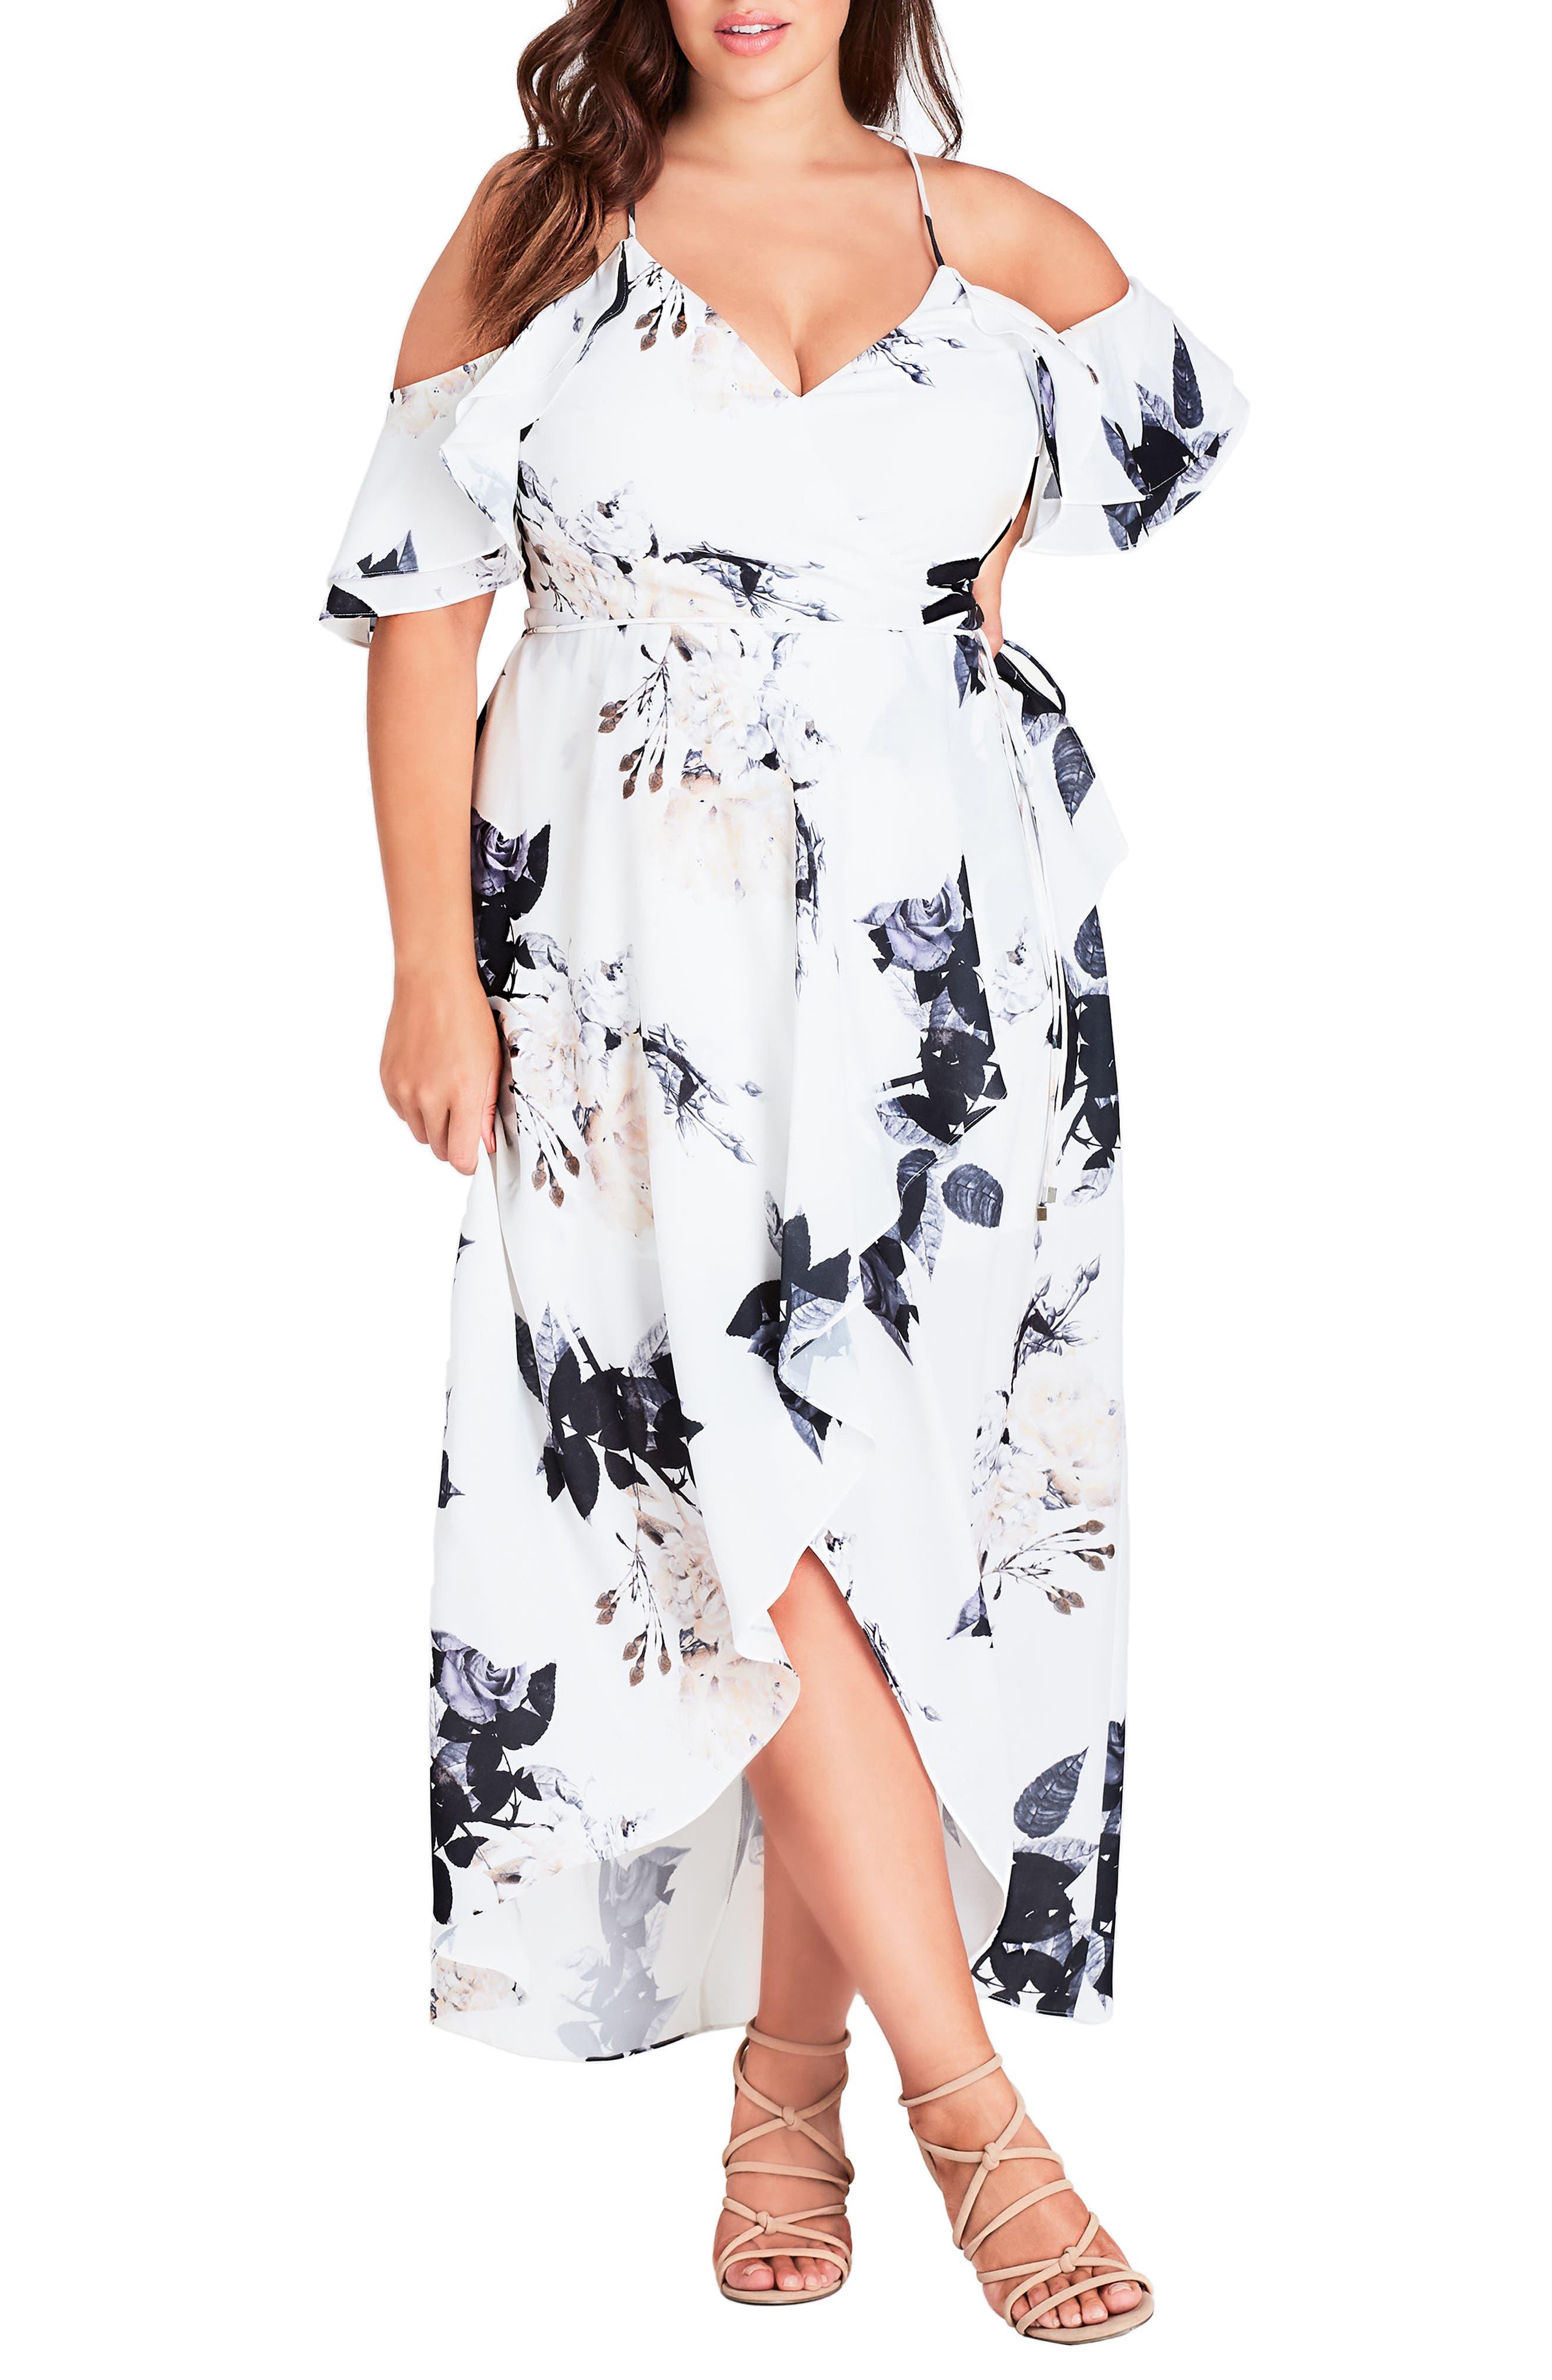 Floral Print Ruffle Maxi Dress,                             Main thumbnail 1, color,                             CREAM FLORAL